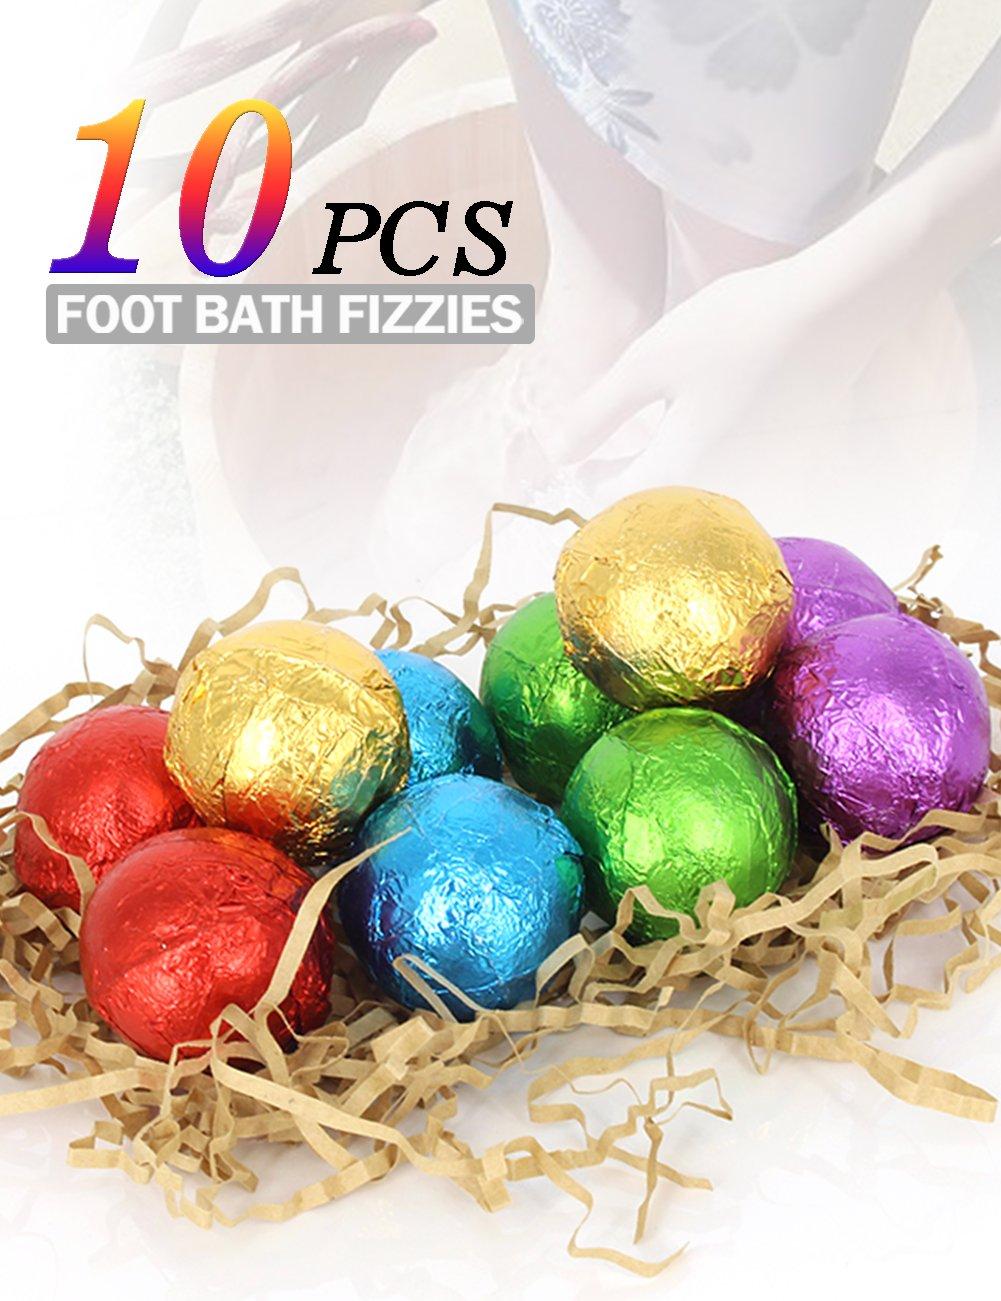 BMK Foot Soak Bath Bombs Essential Oil Feet Spa Soap All Natural Organic Bath Salt Fizzies Eliminates Odors Softens Dry Calluses Detox Tired Feet (10PCS)